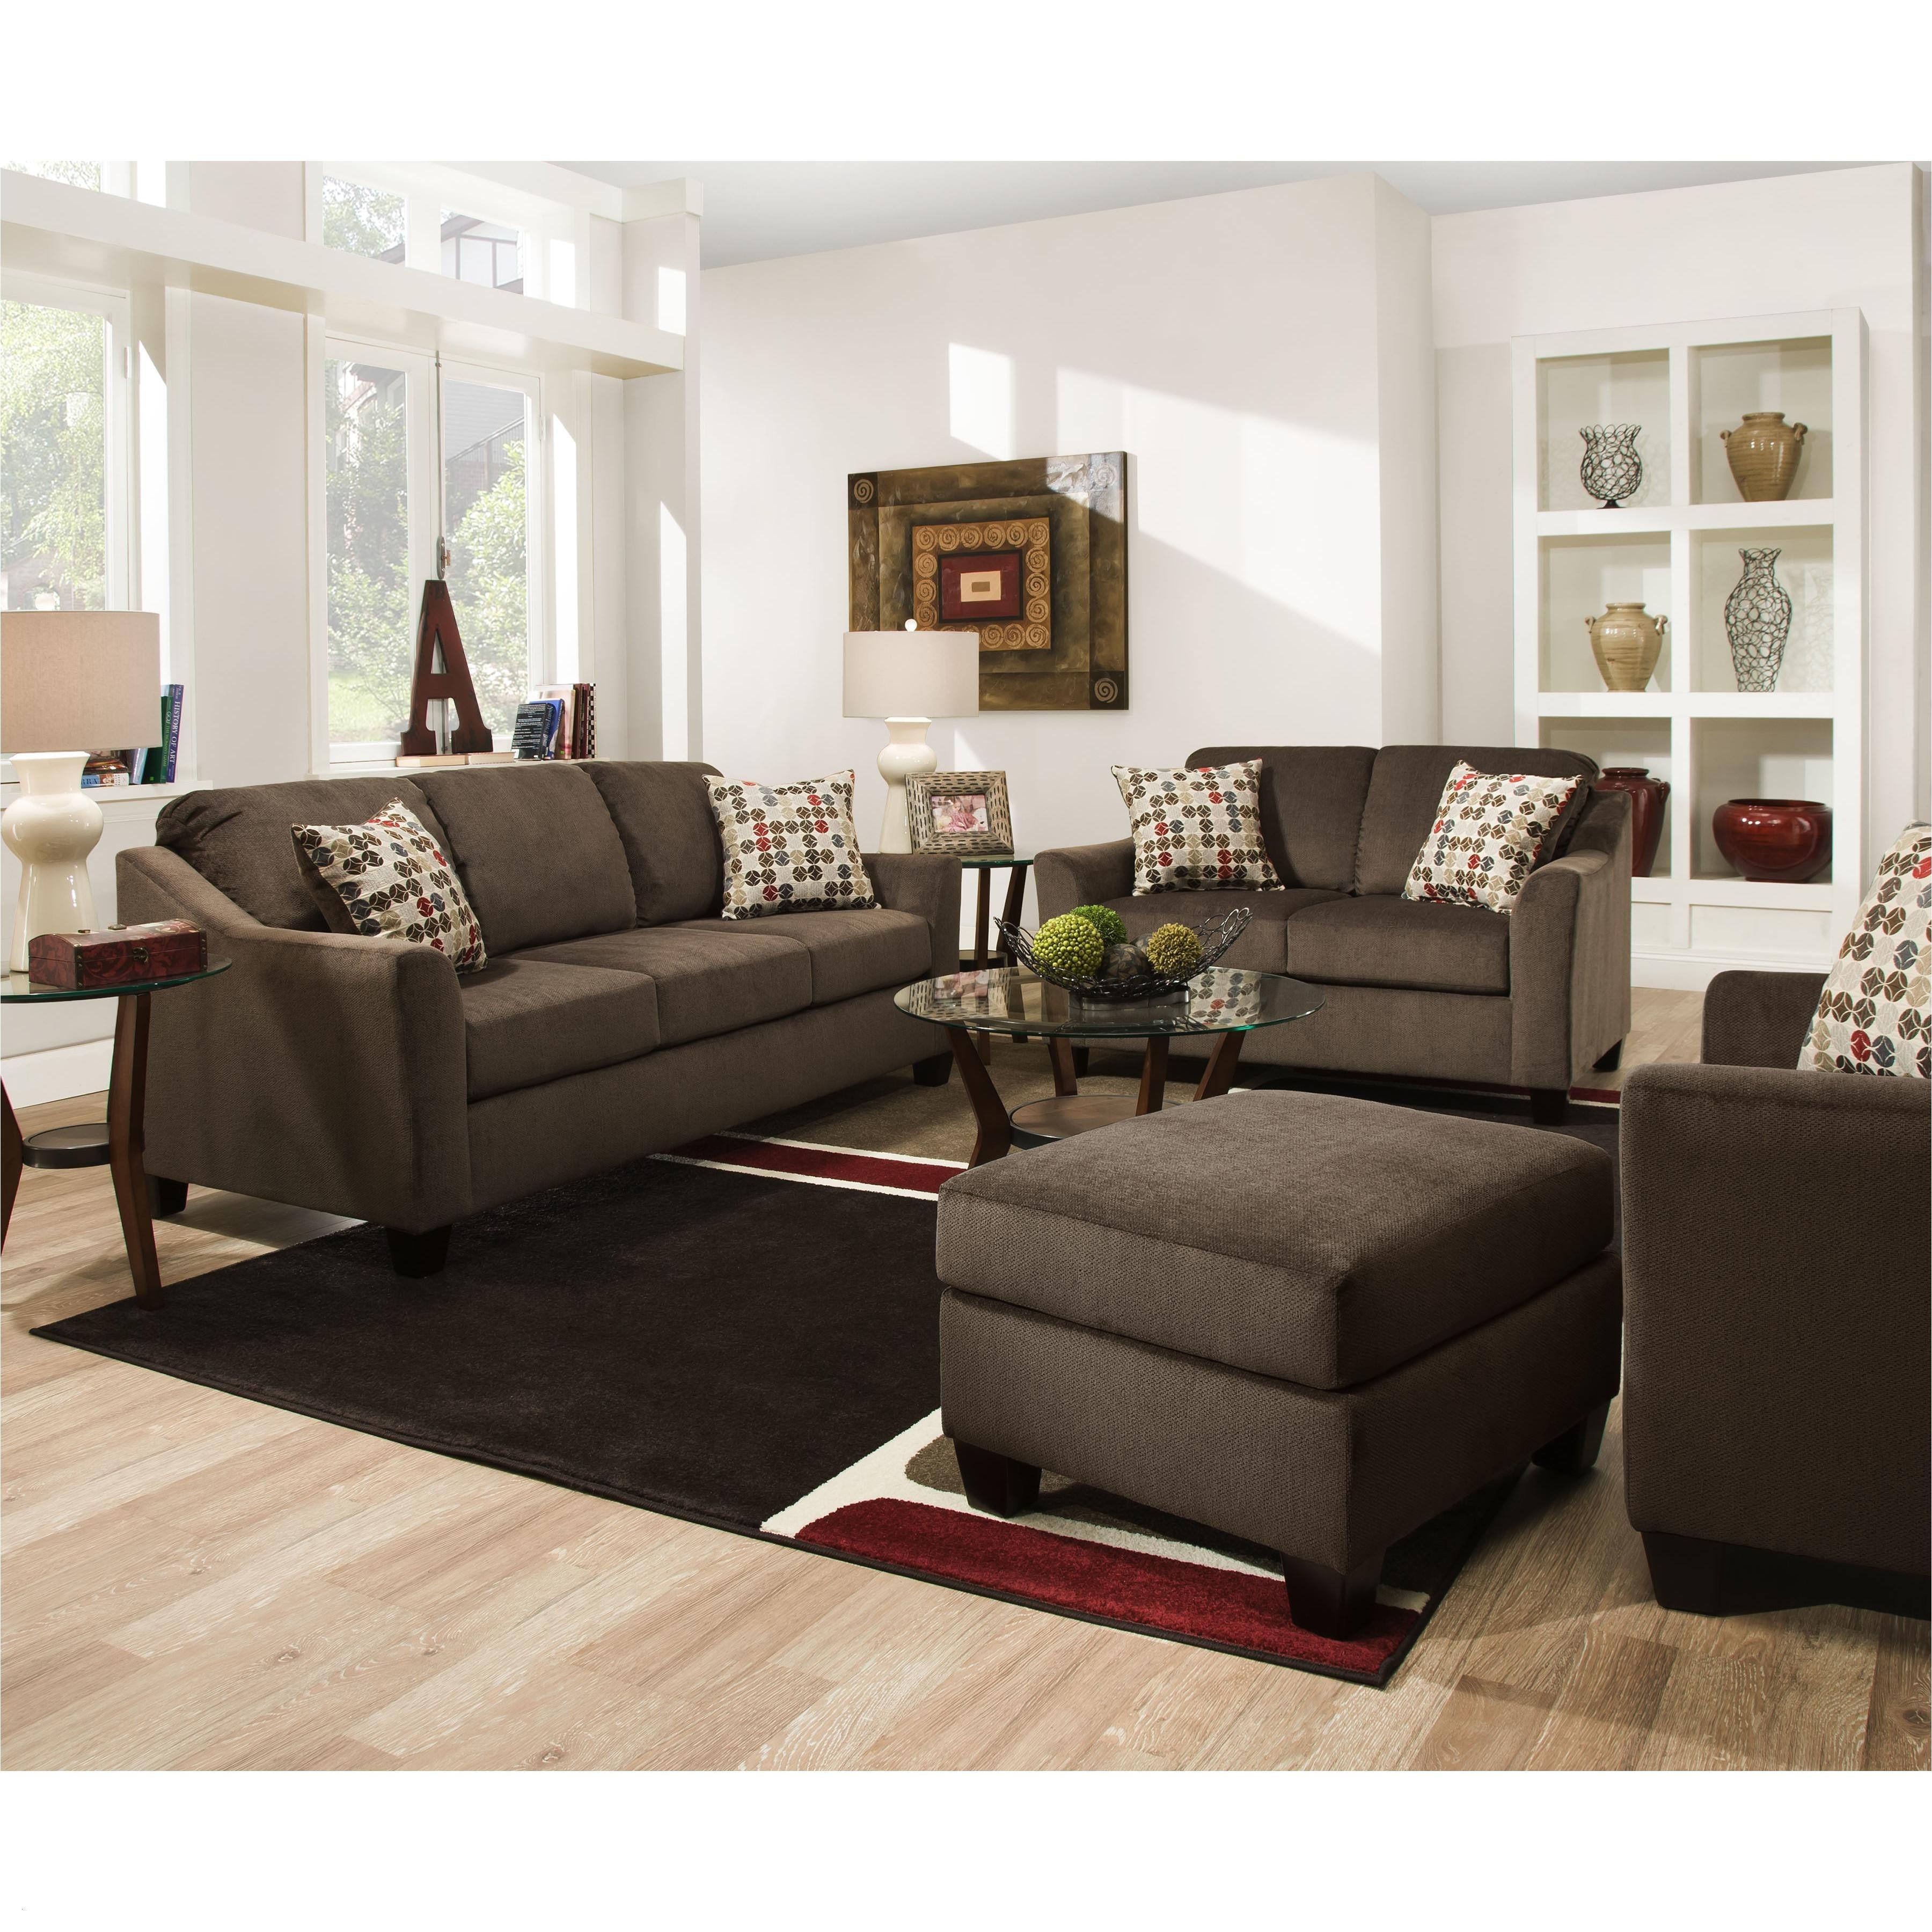 patio land beautiful furniture sleeper loveseat inspirational wicker outdoor sofa 0d patio land fresh gable